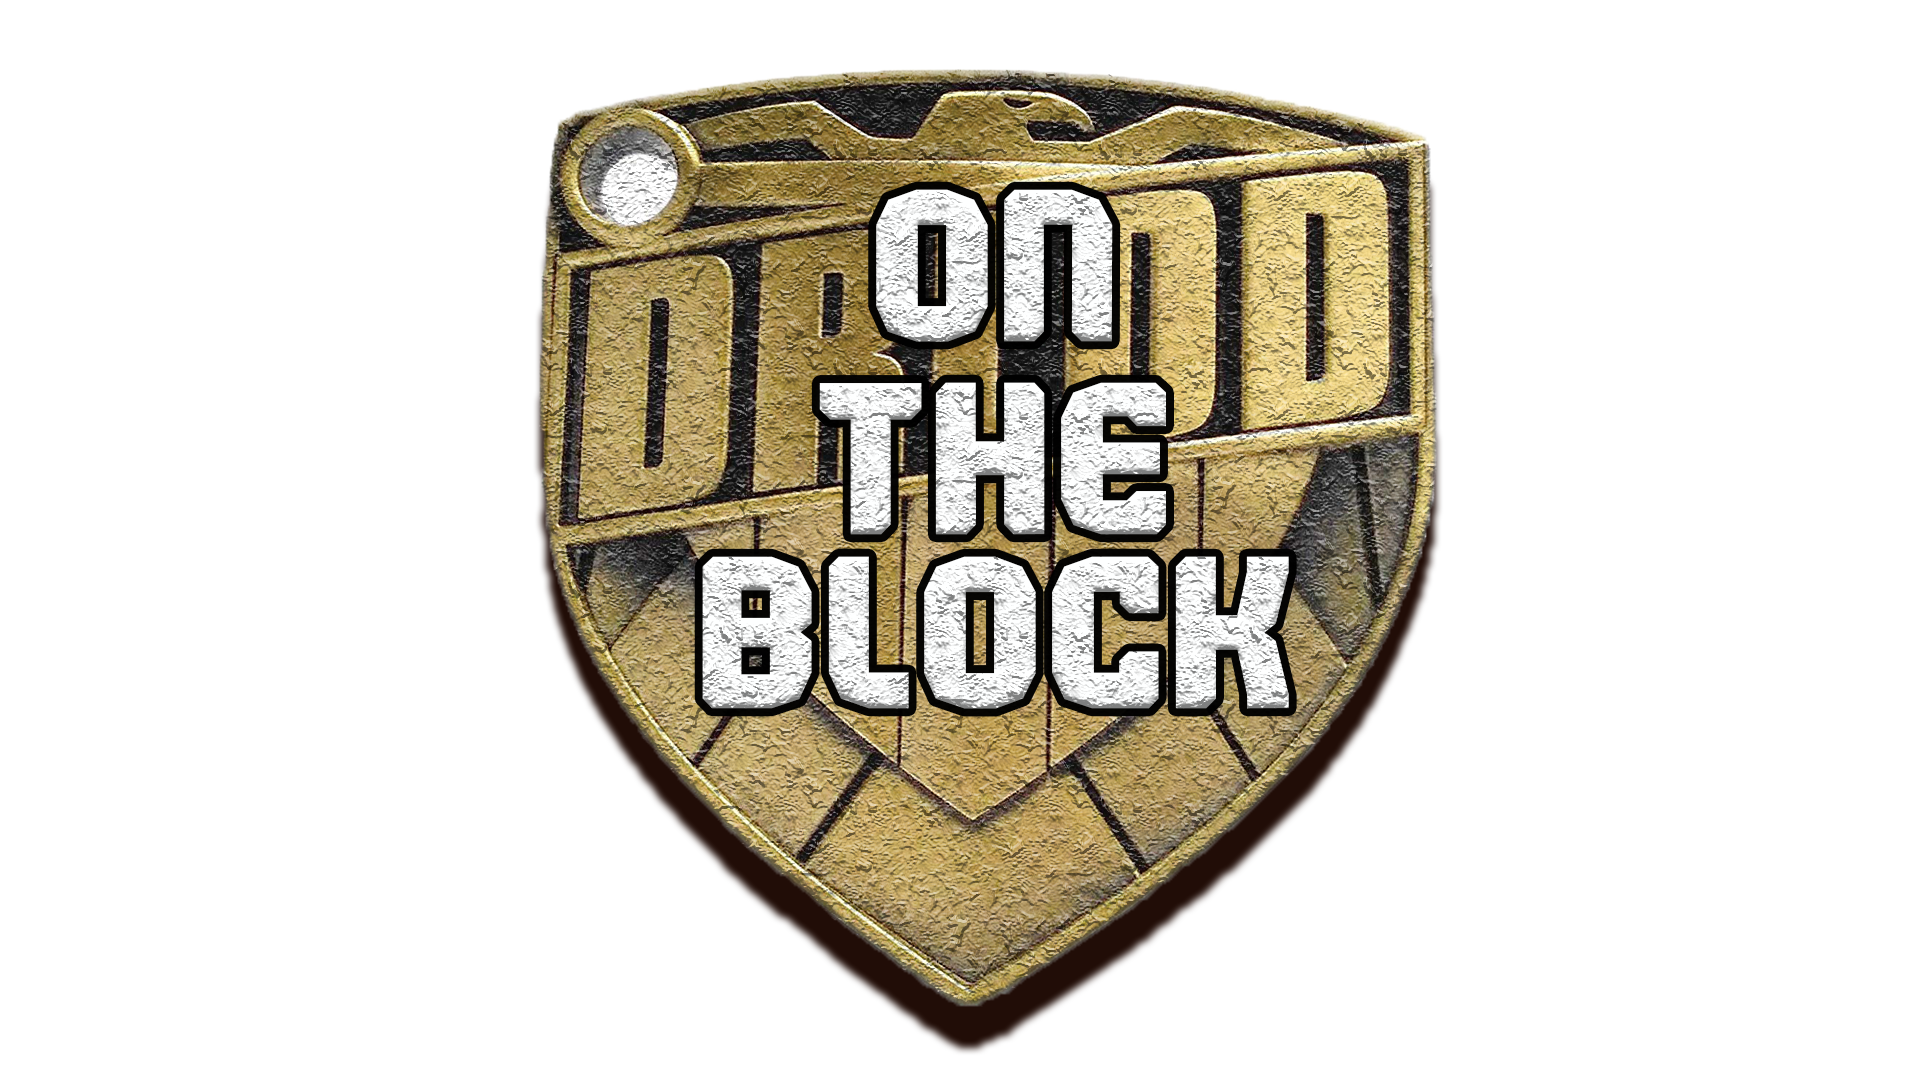 Episode 5 - Judge Dredd: On The Block show art